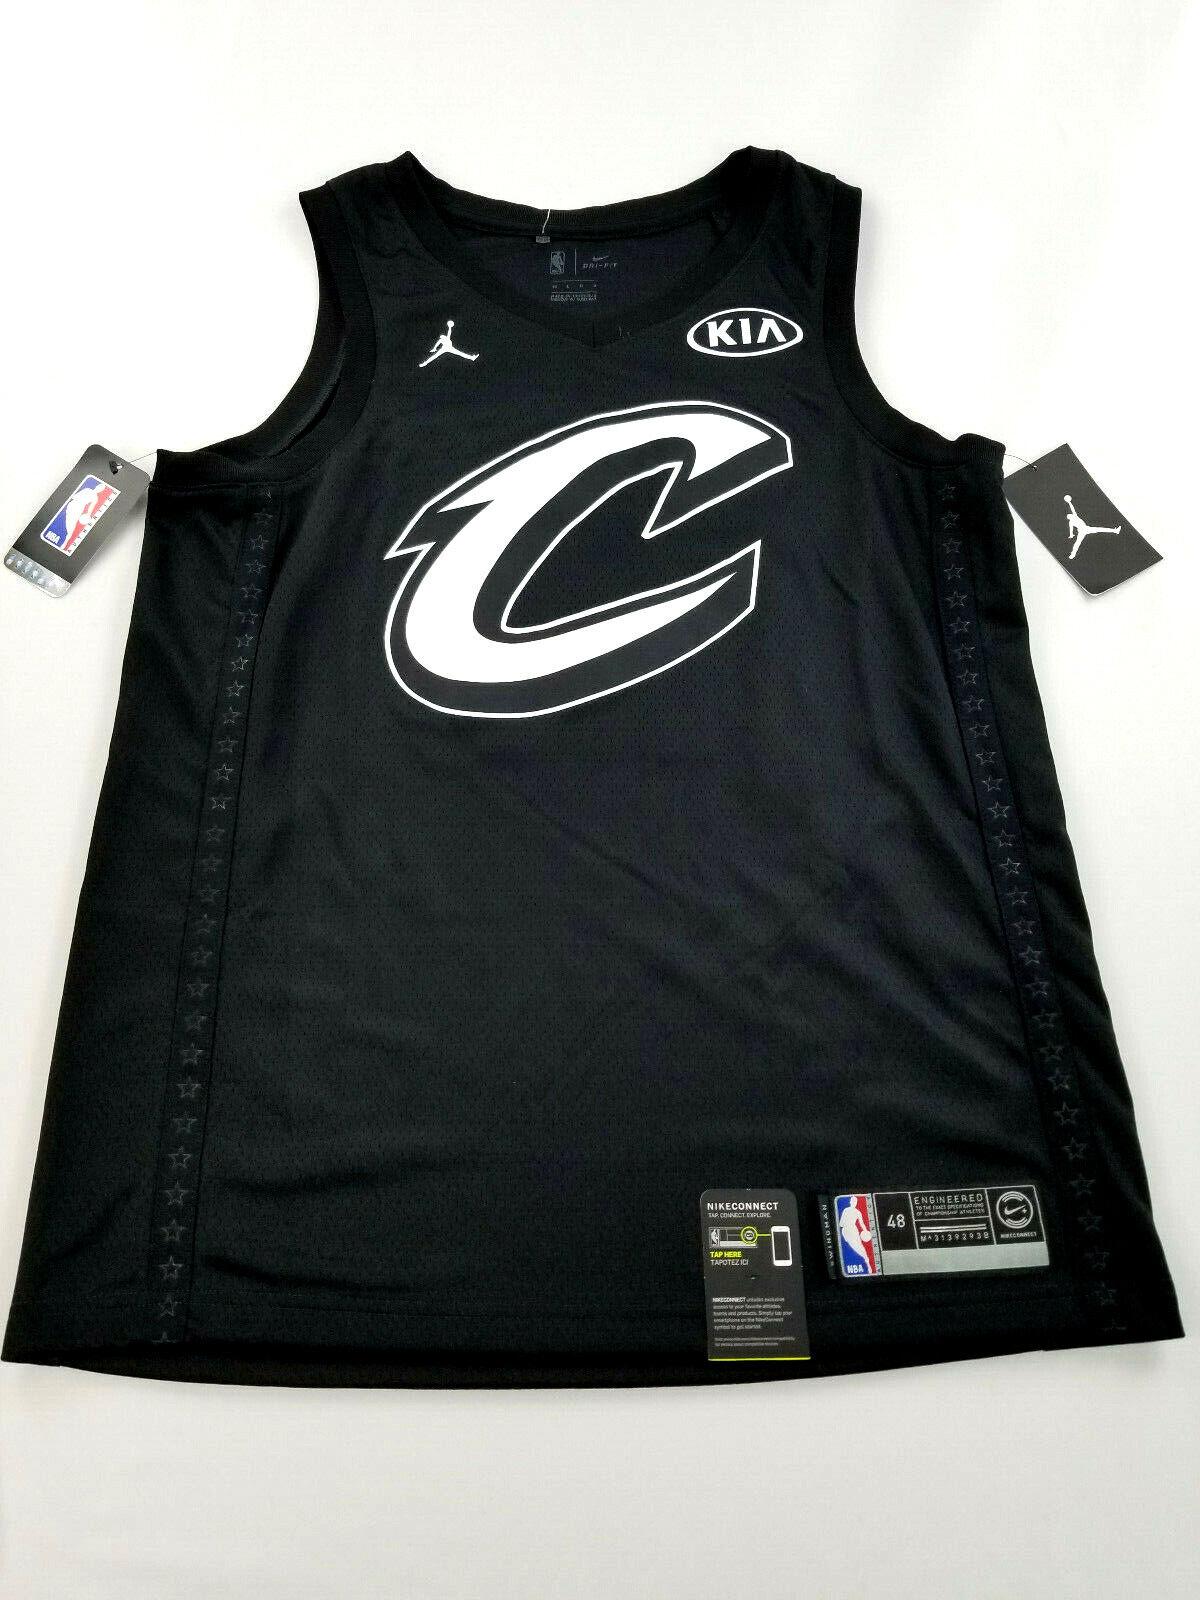 Nueva camisa para hombres JORDAN All-Star James 23 Jersey NBA Baloncesto Negro 48 L MSRP  120